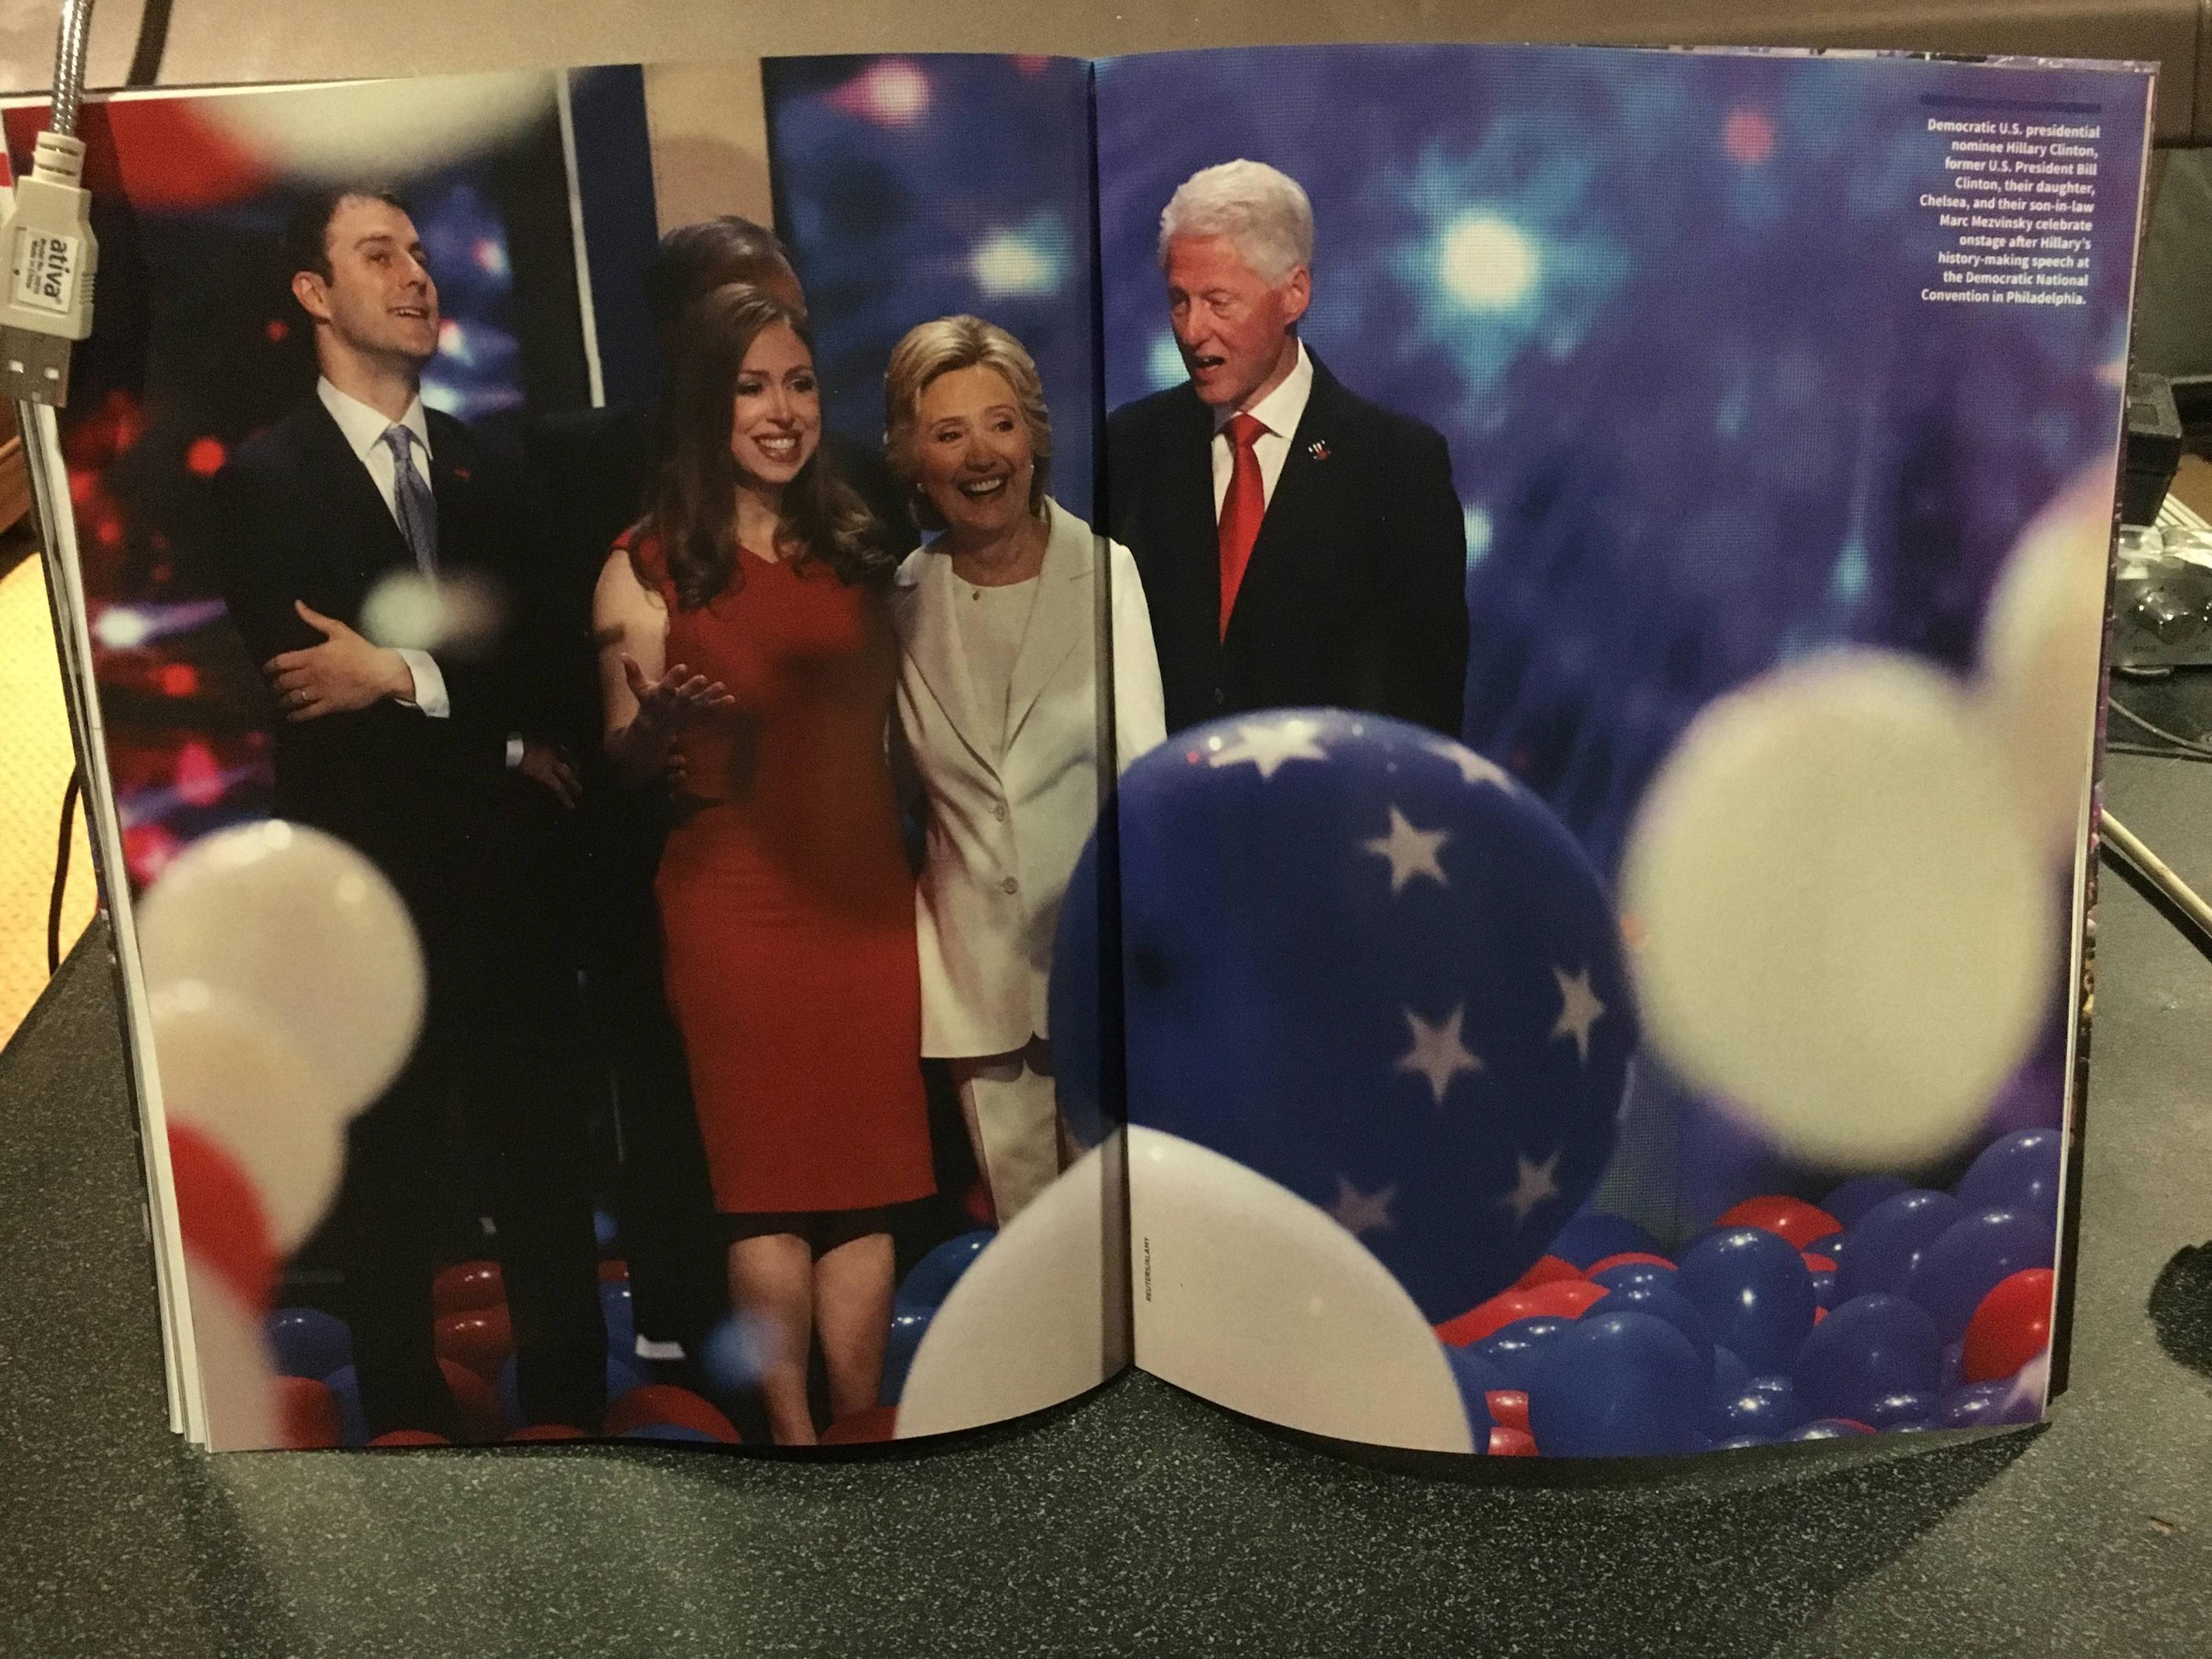 newsweek-madame-hillary-clinton-page-38